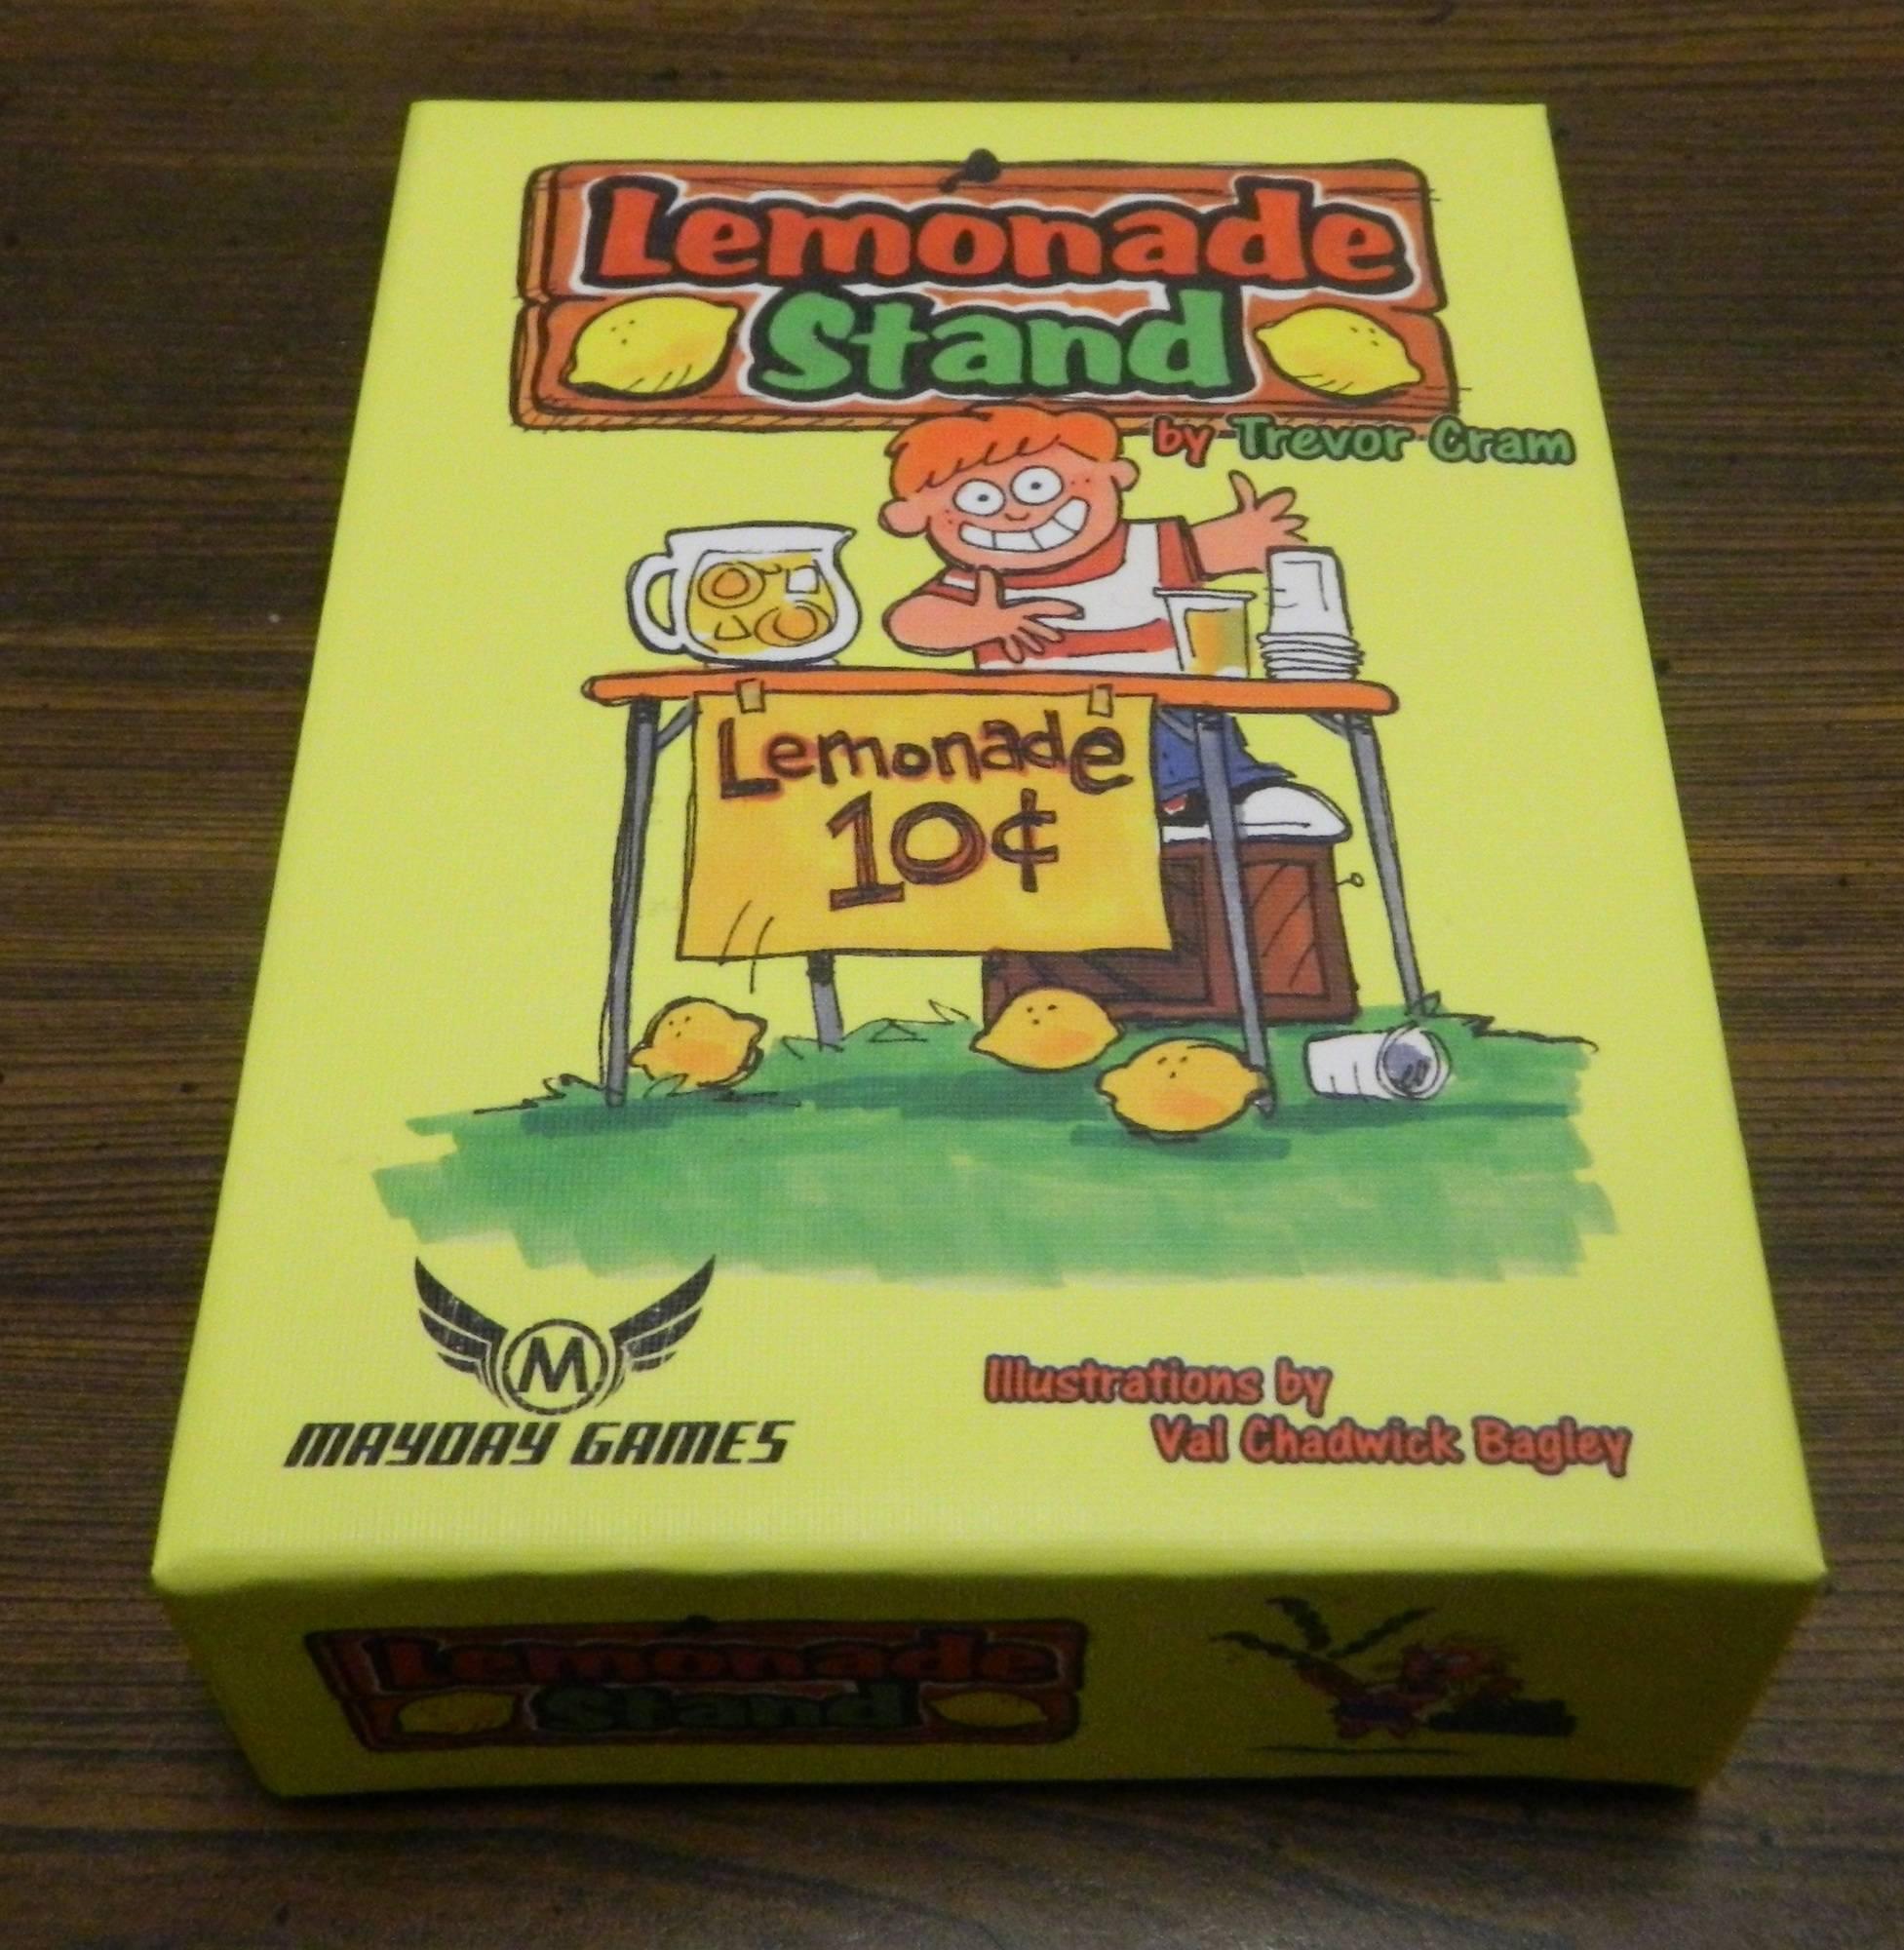 Box for Lemonade Stand